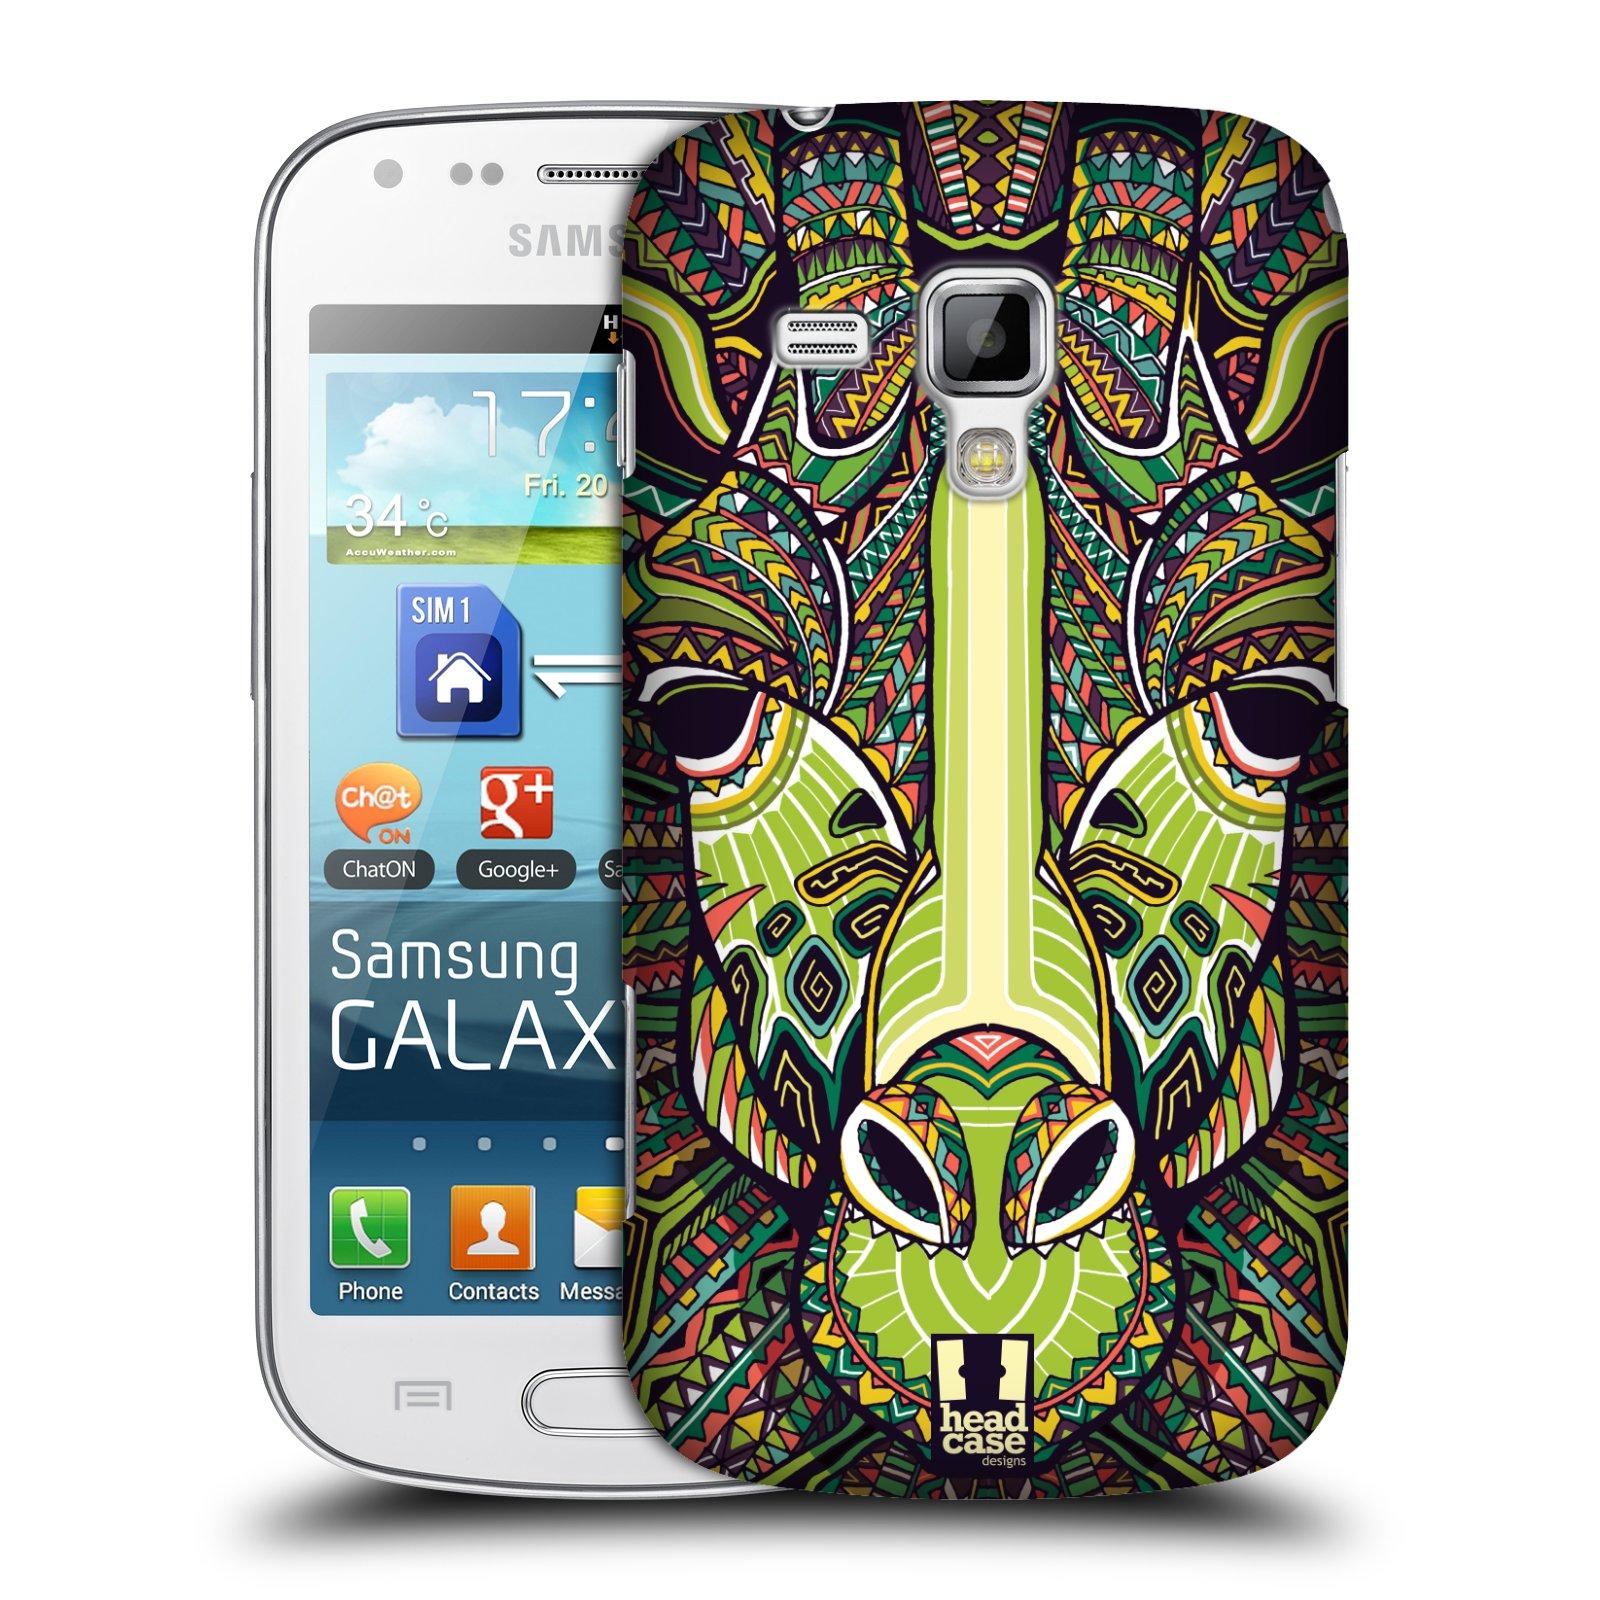 Plastové pouzdro na mobil Samsung Galaxy S Duos 2 HEAD CASE AZTEC ŽIRAFA (Kryt či obal na mobilní telefon Samsung Galaxy S Duos 2 GT-S7582)